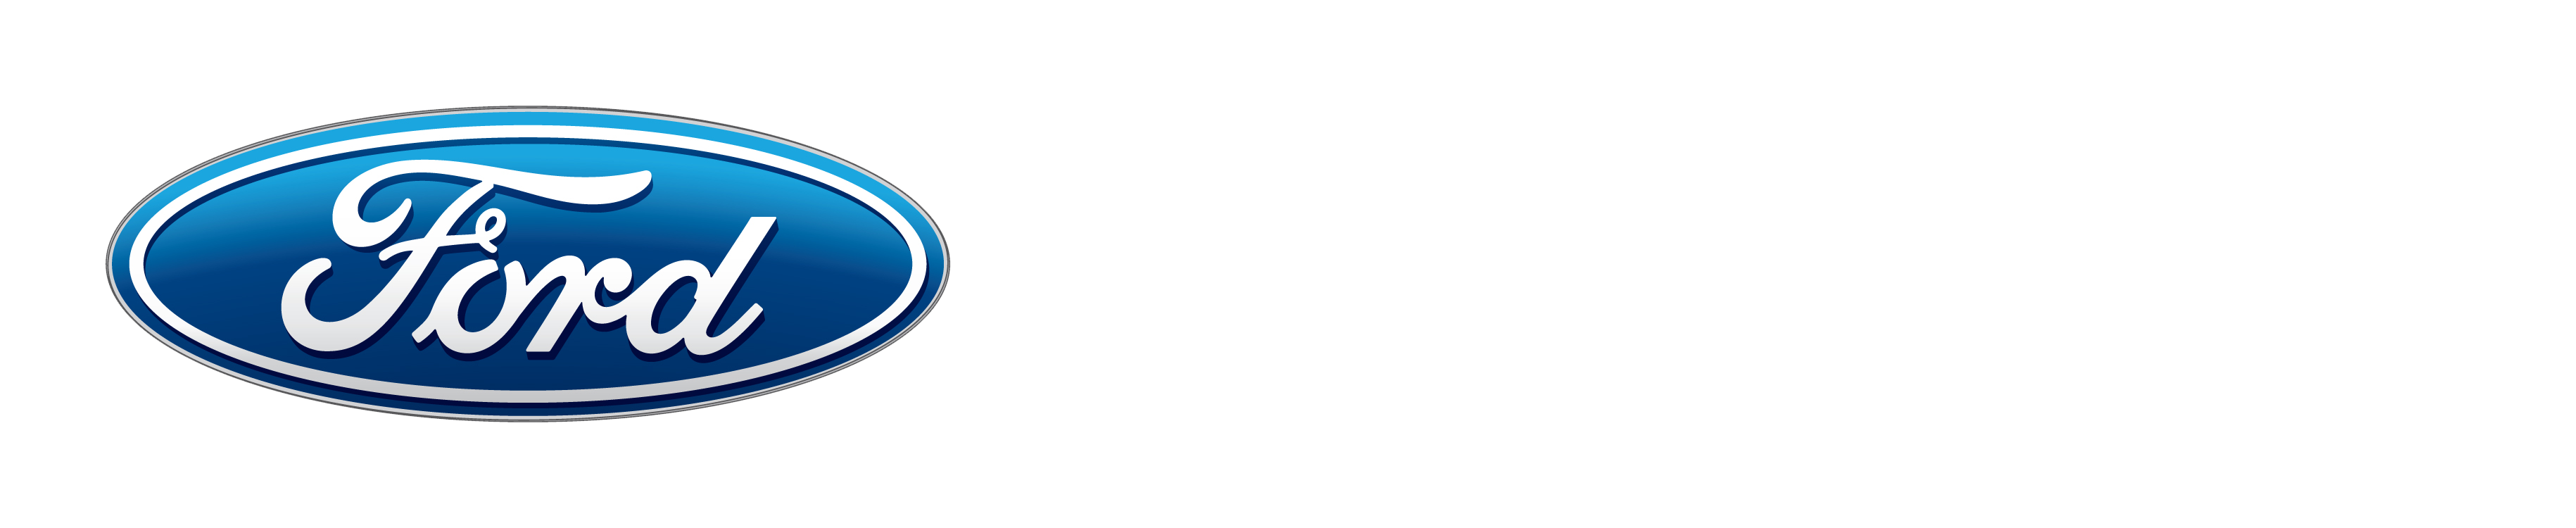 Peoria Ford logo